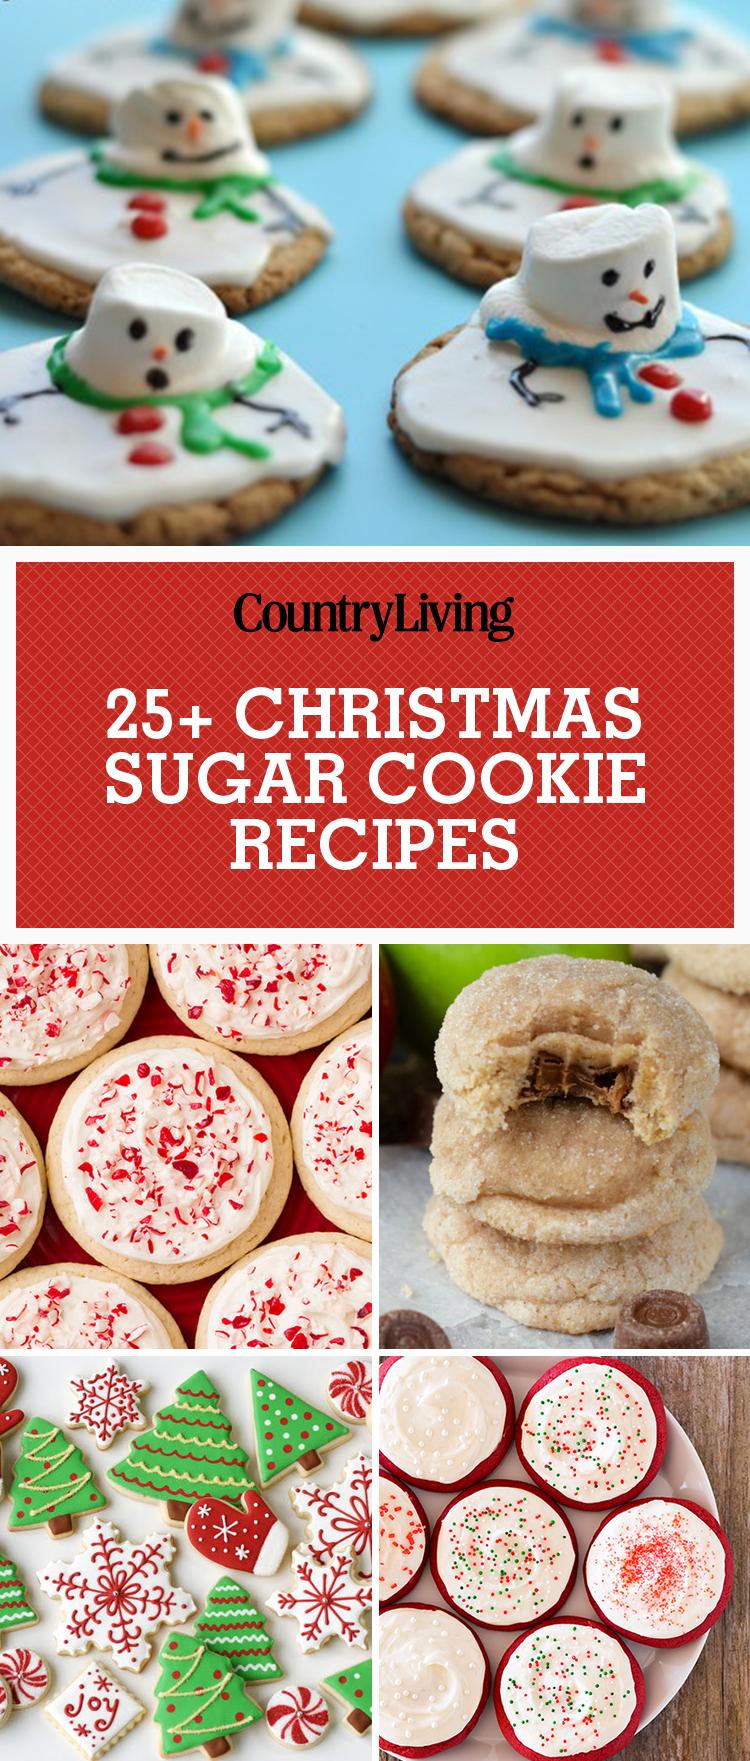 25 Easy Christmas Sugar Cookies Recipes Amp Decorating